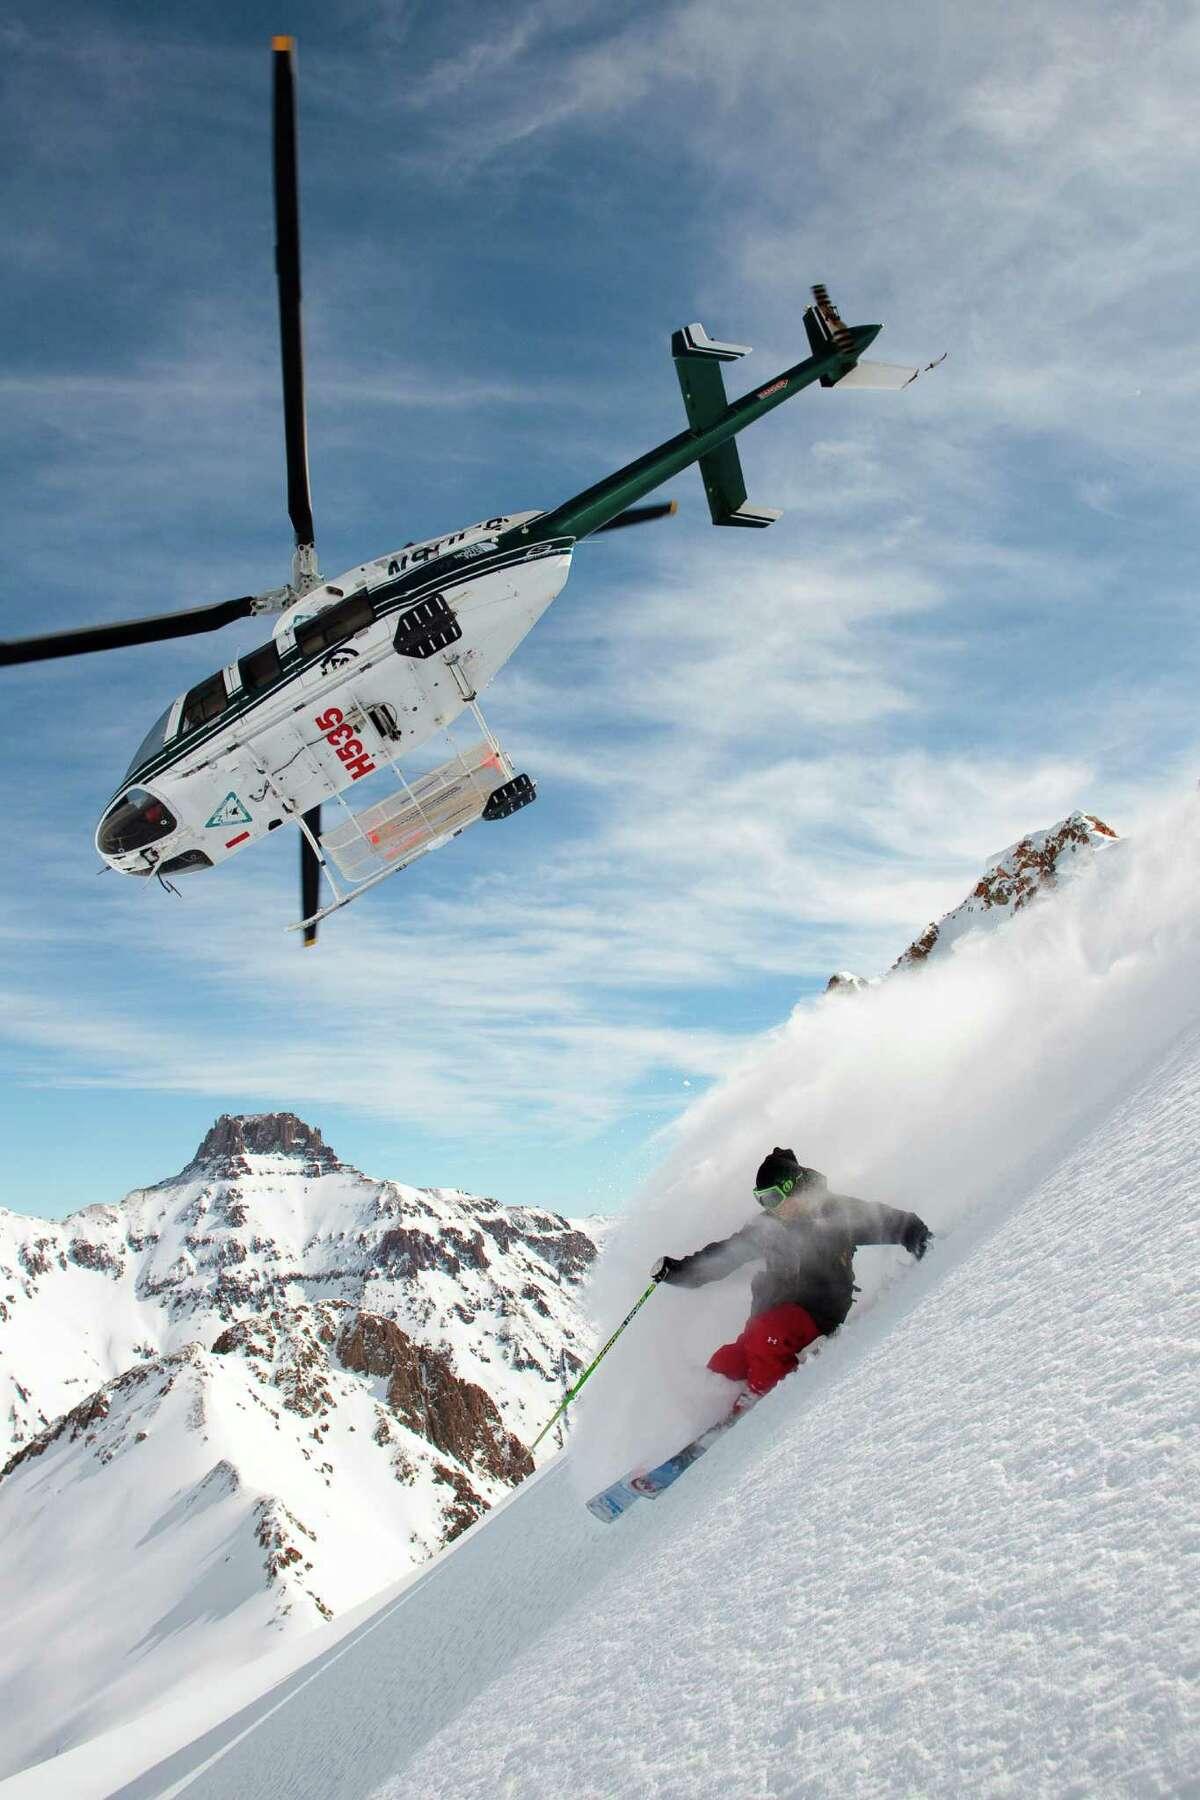 Helitrax heli-ski company takes skiers from Telluride to pristine ski spots across the San Juan Mountains.